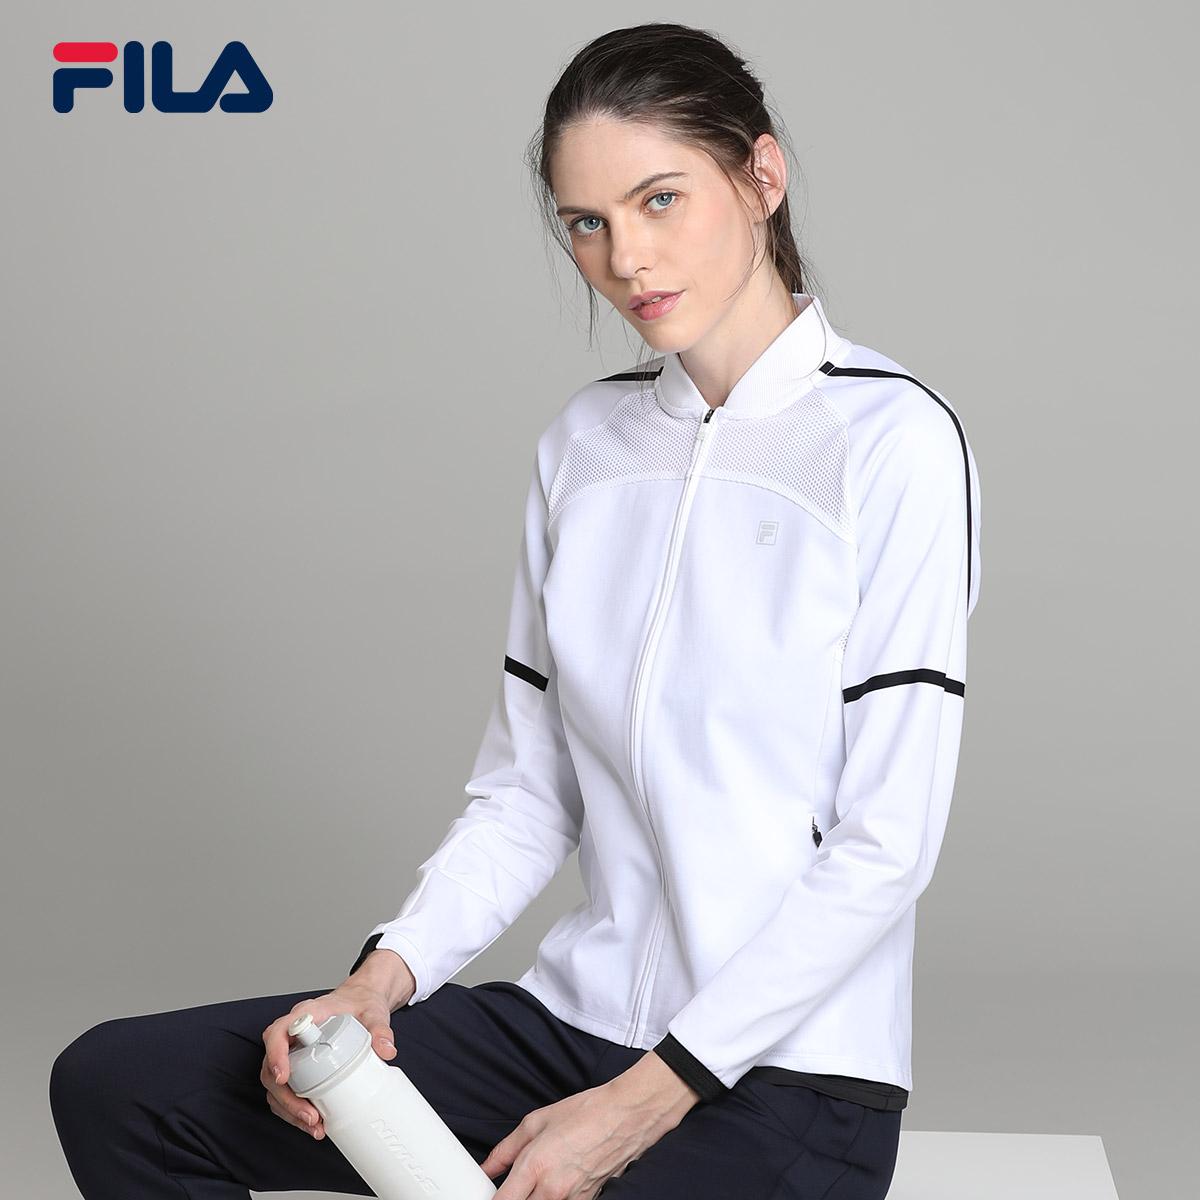 FILA斐乐女外套2018秋季新品休闲针织立领健身运动外套女